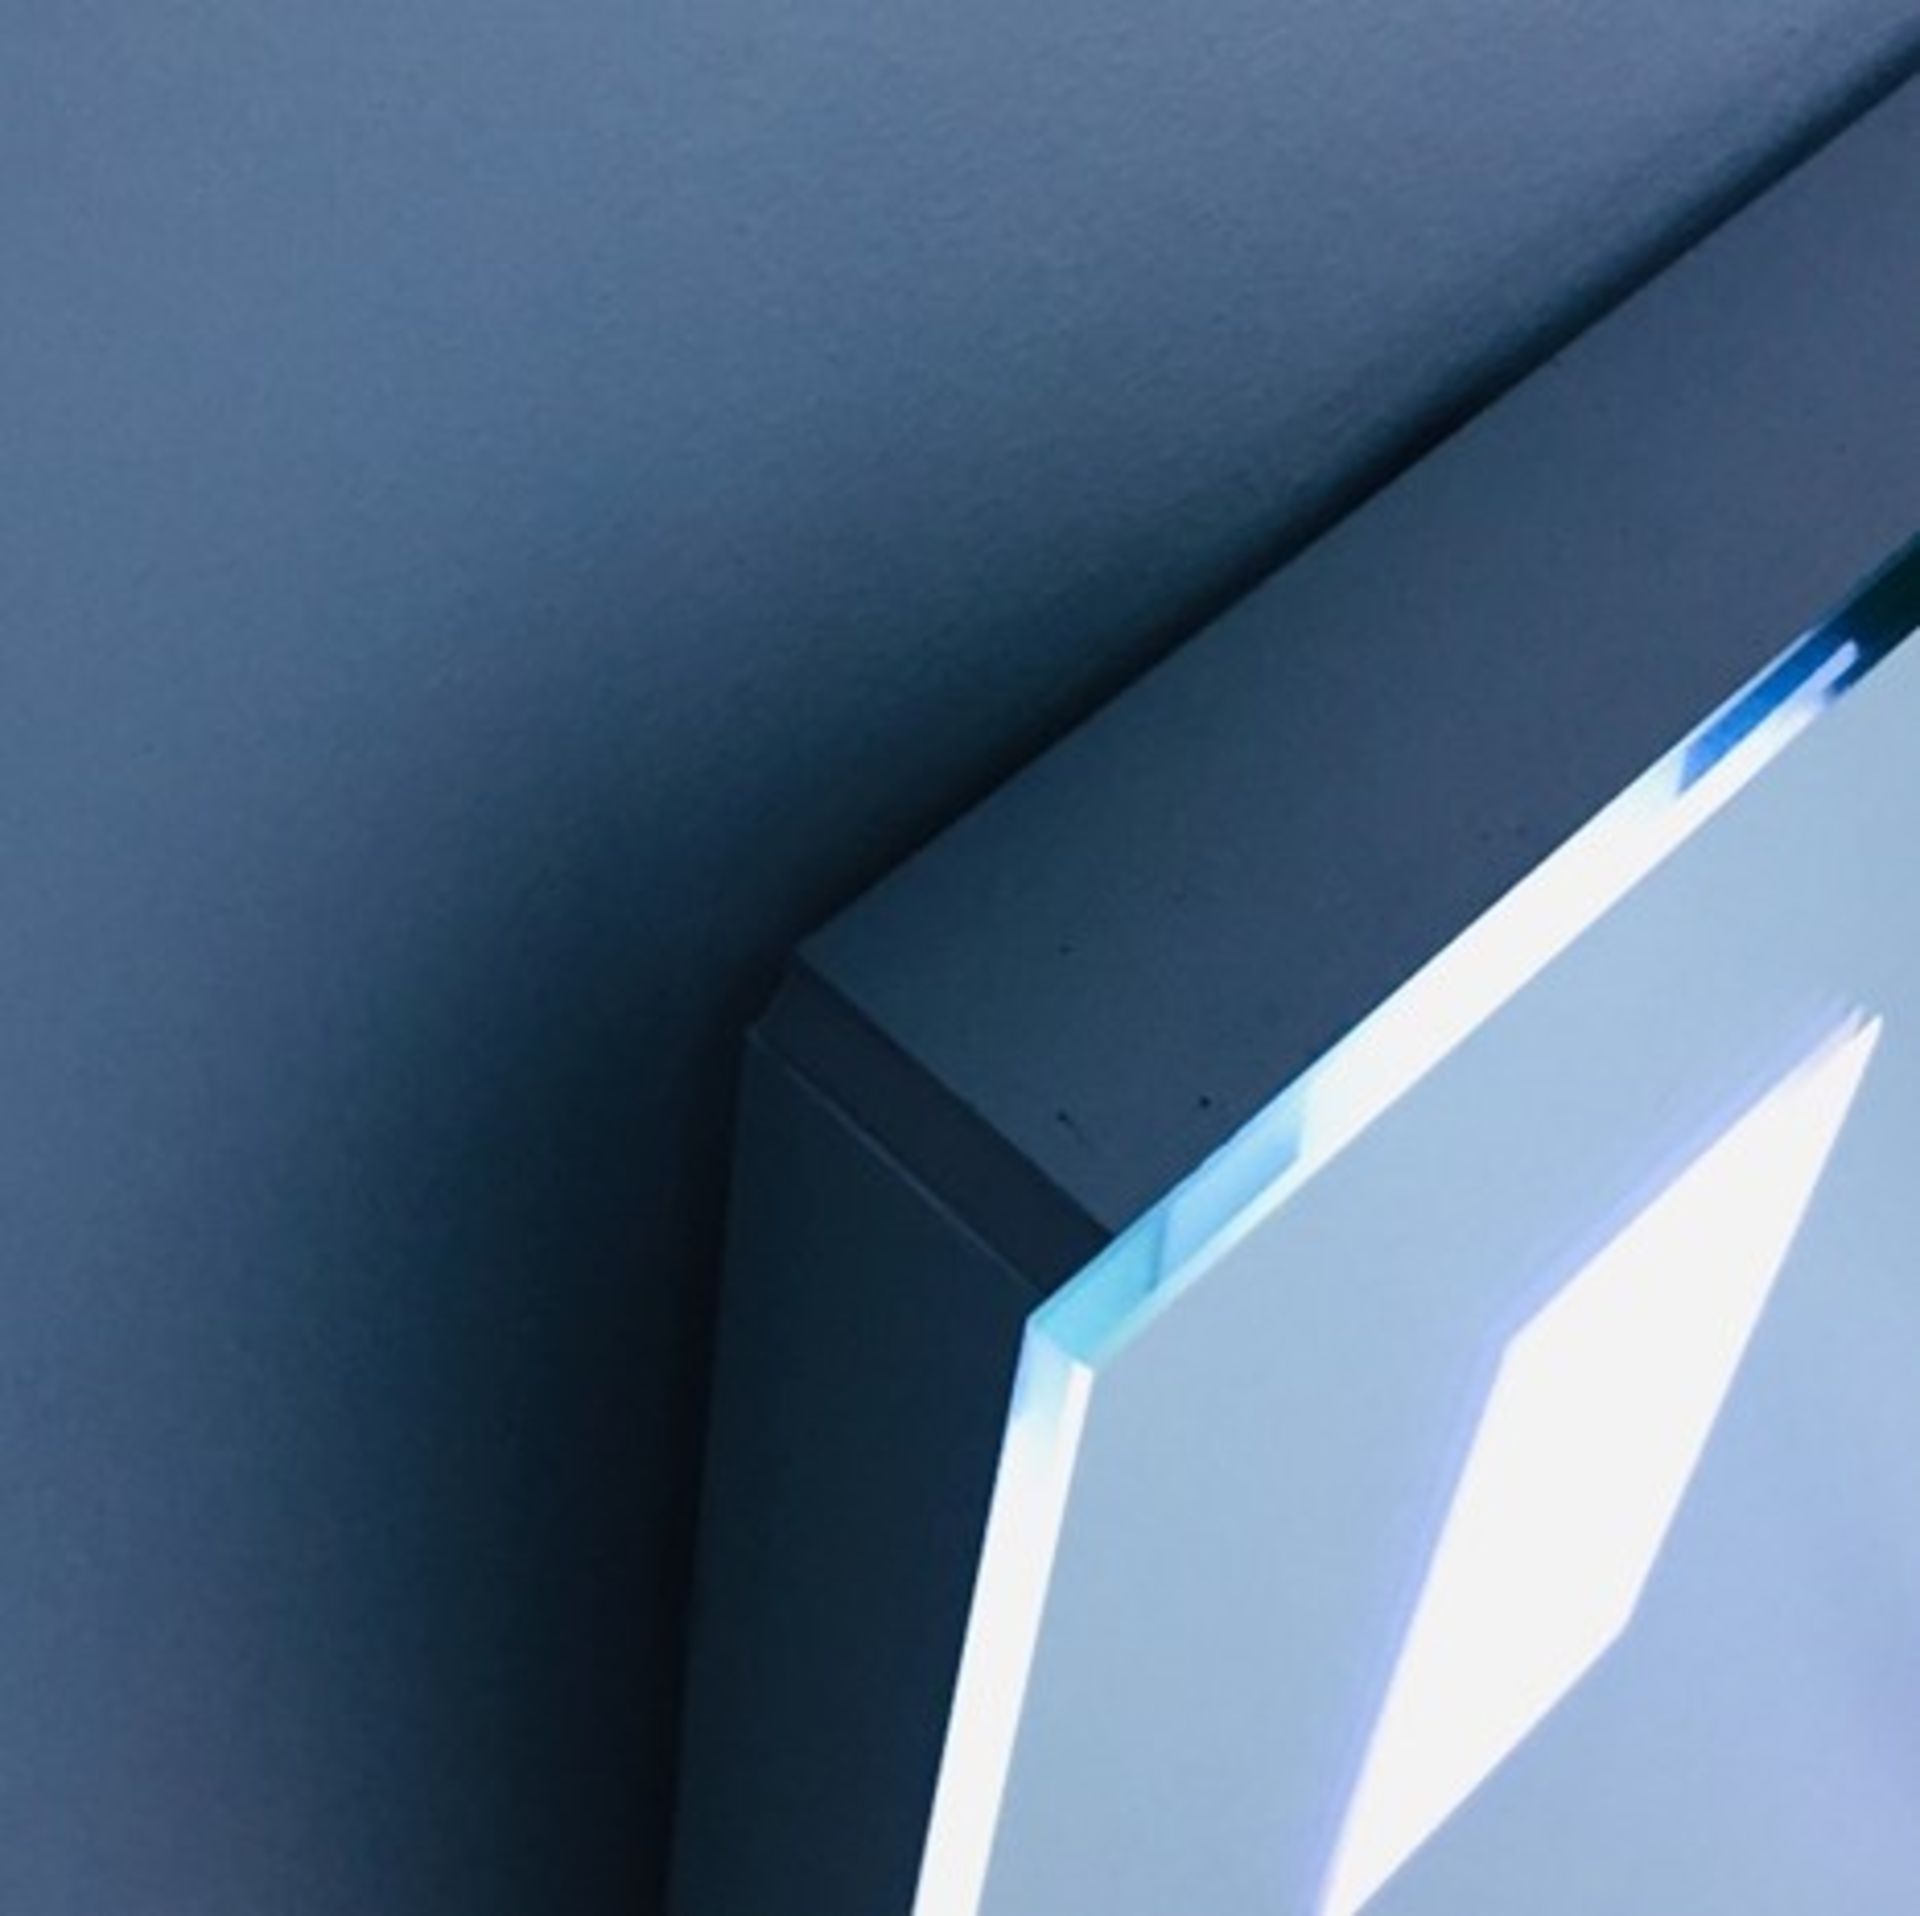 Lot 46 - x 5 Bathroom Illuminated LED Mirrors